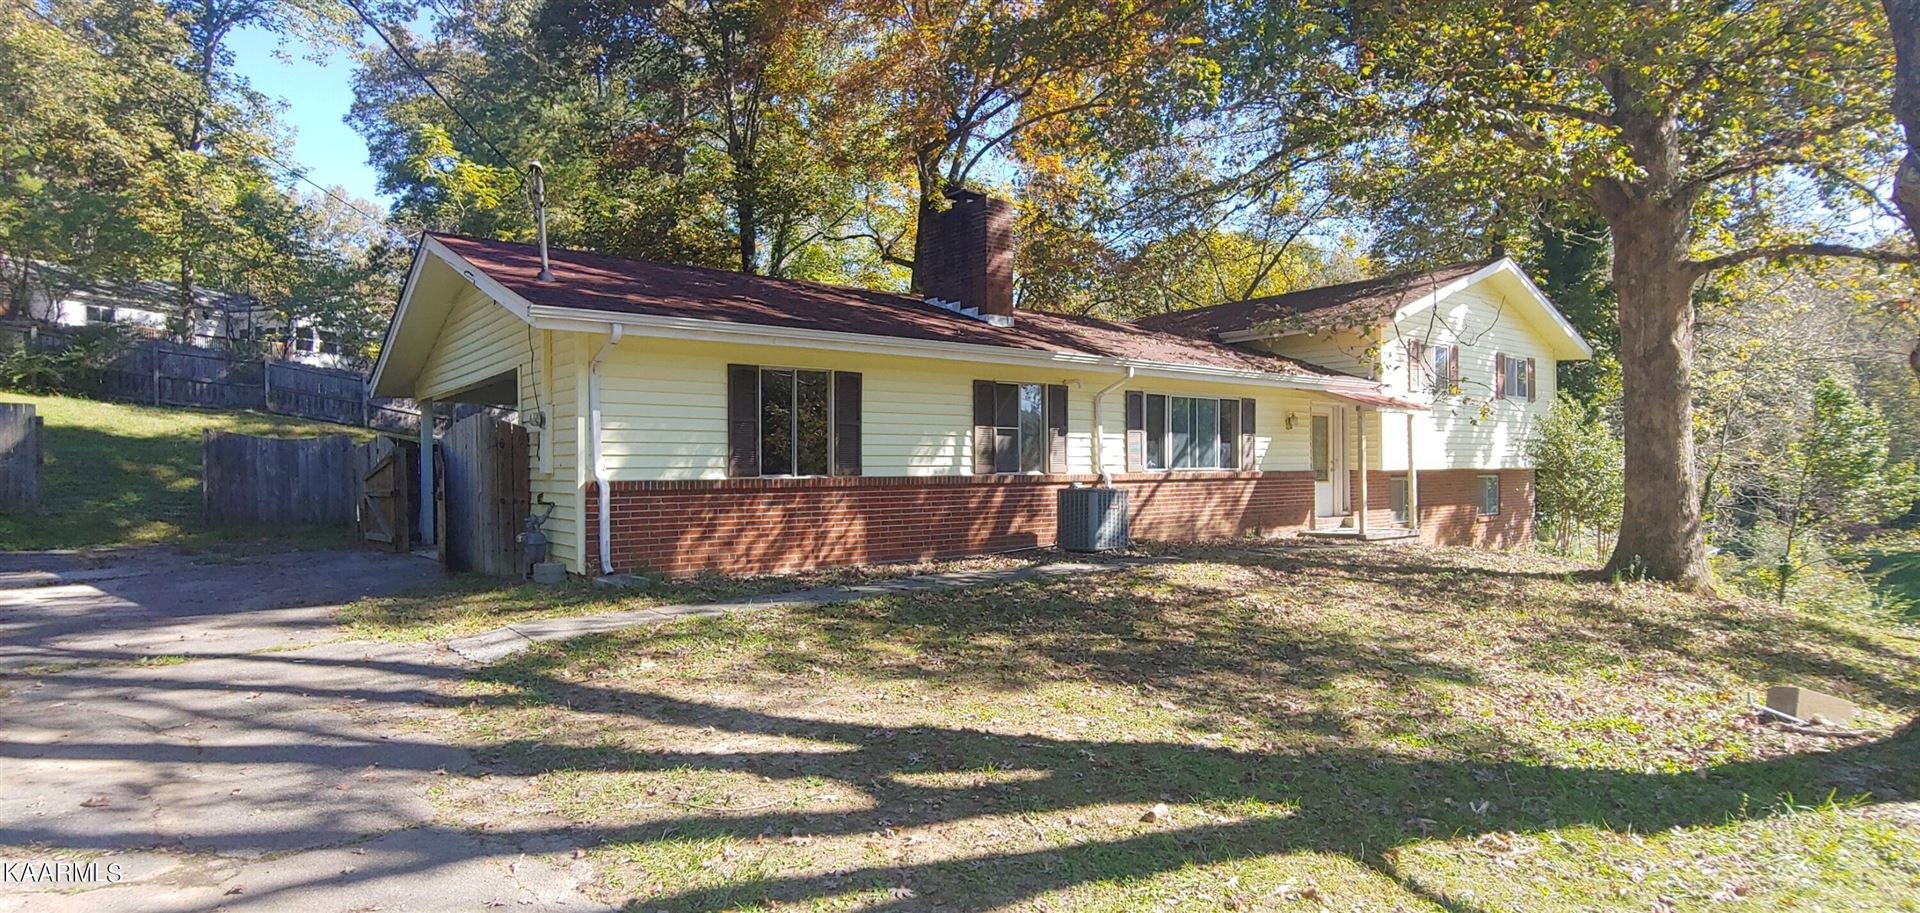 Photo of 126 Miramar Circle, Oak Ridge, TN 37830 (MLS # 1171011)